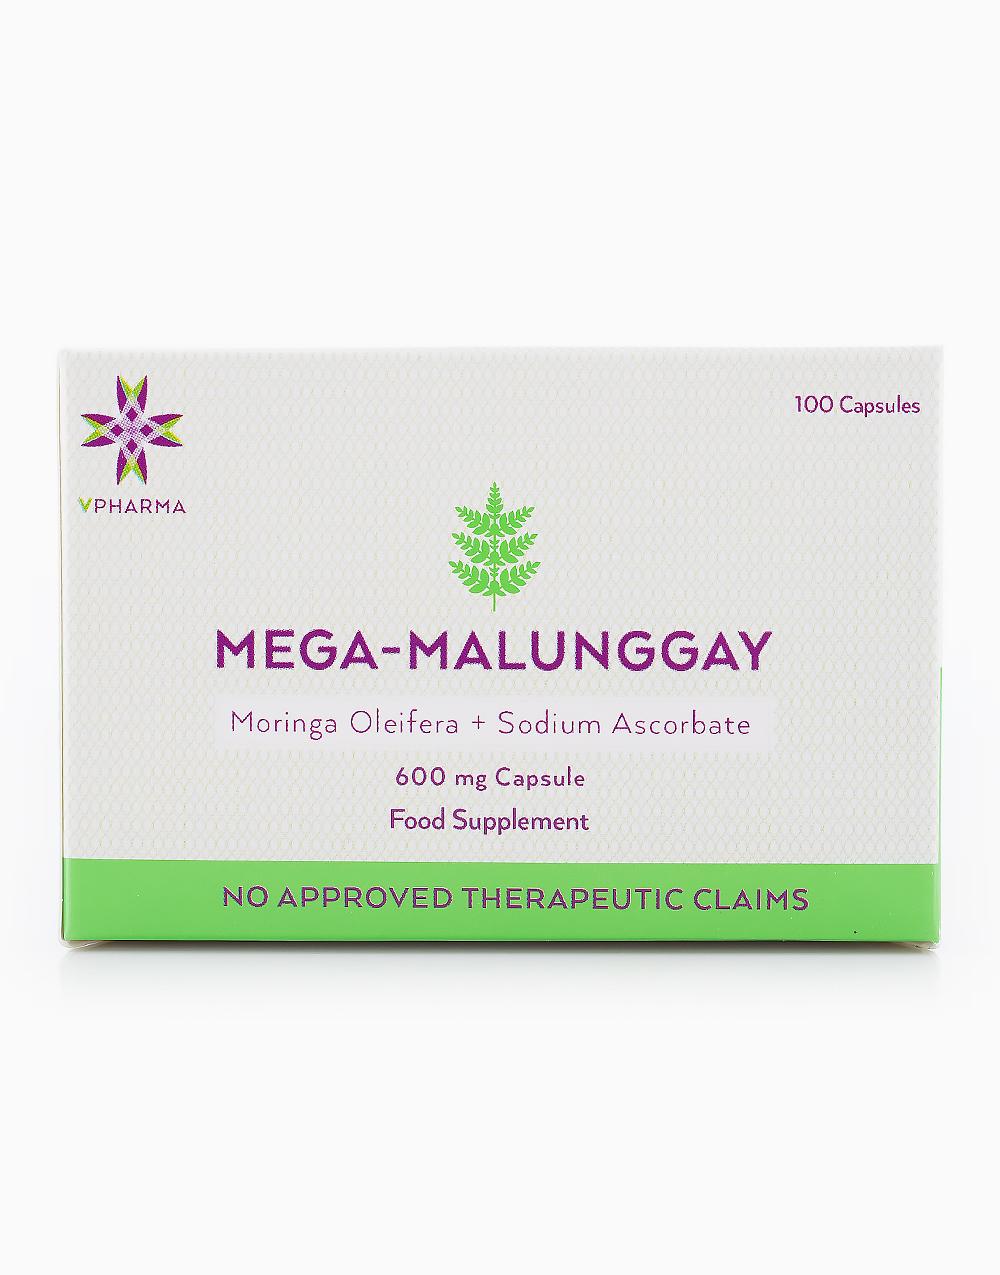 Mega-Malunggay (100 Capsules) by VPharma